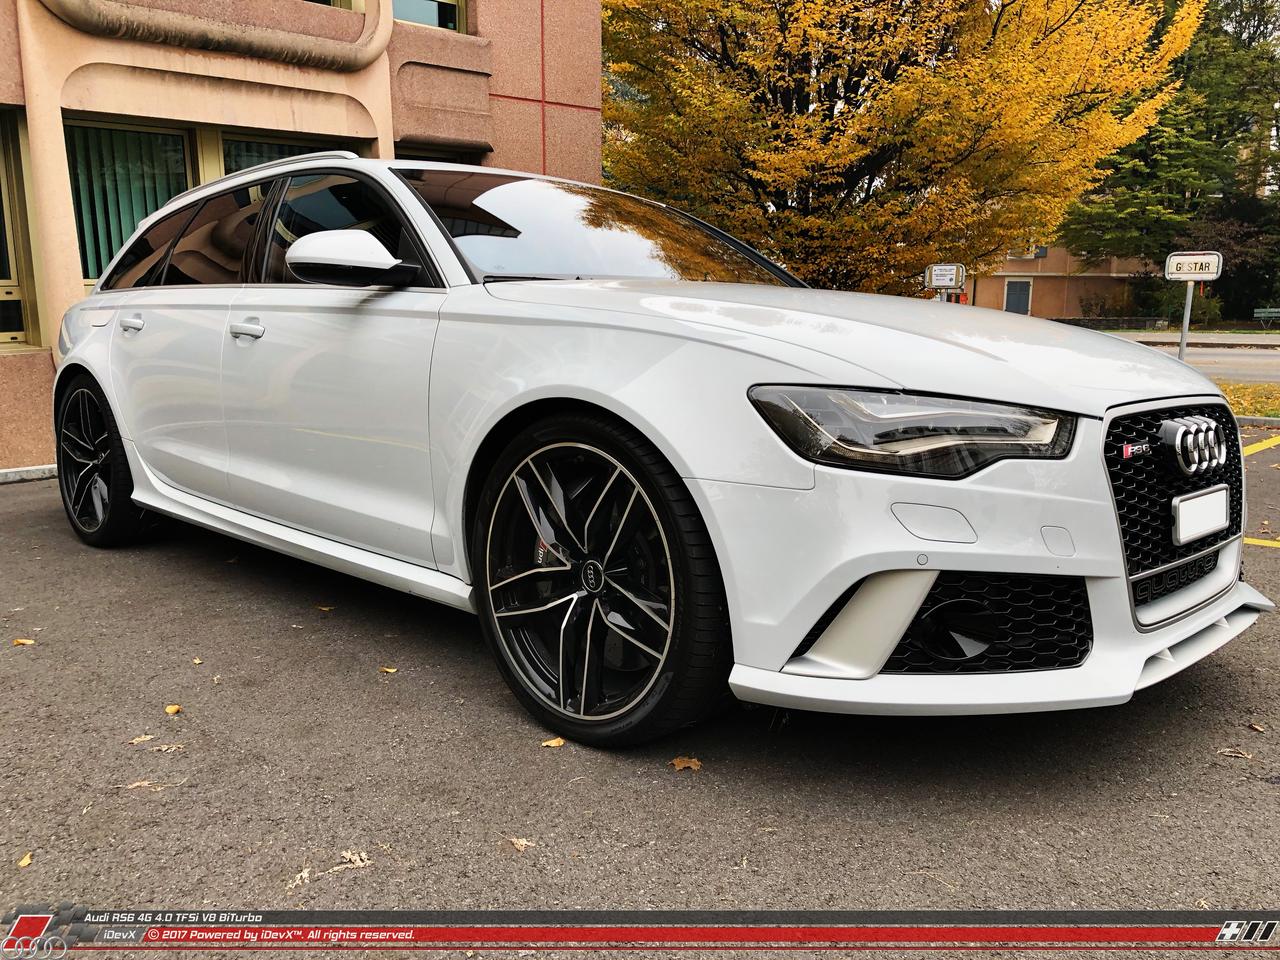 10_11.2018_Audi-RS6_iDevX_022.png